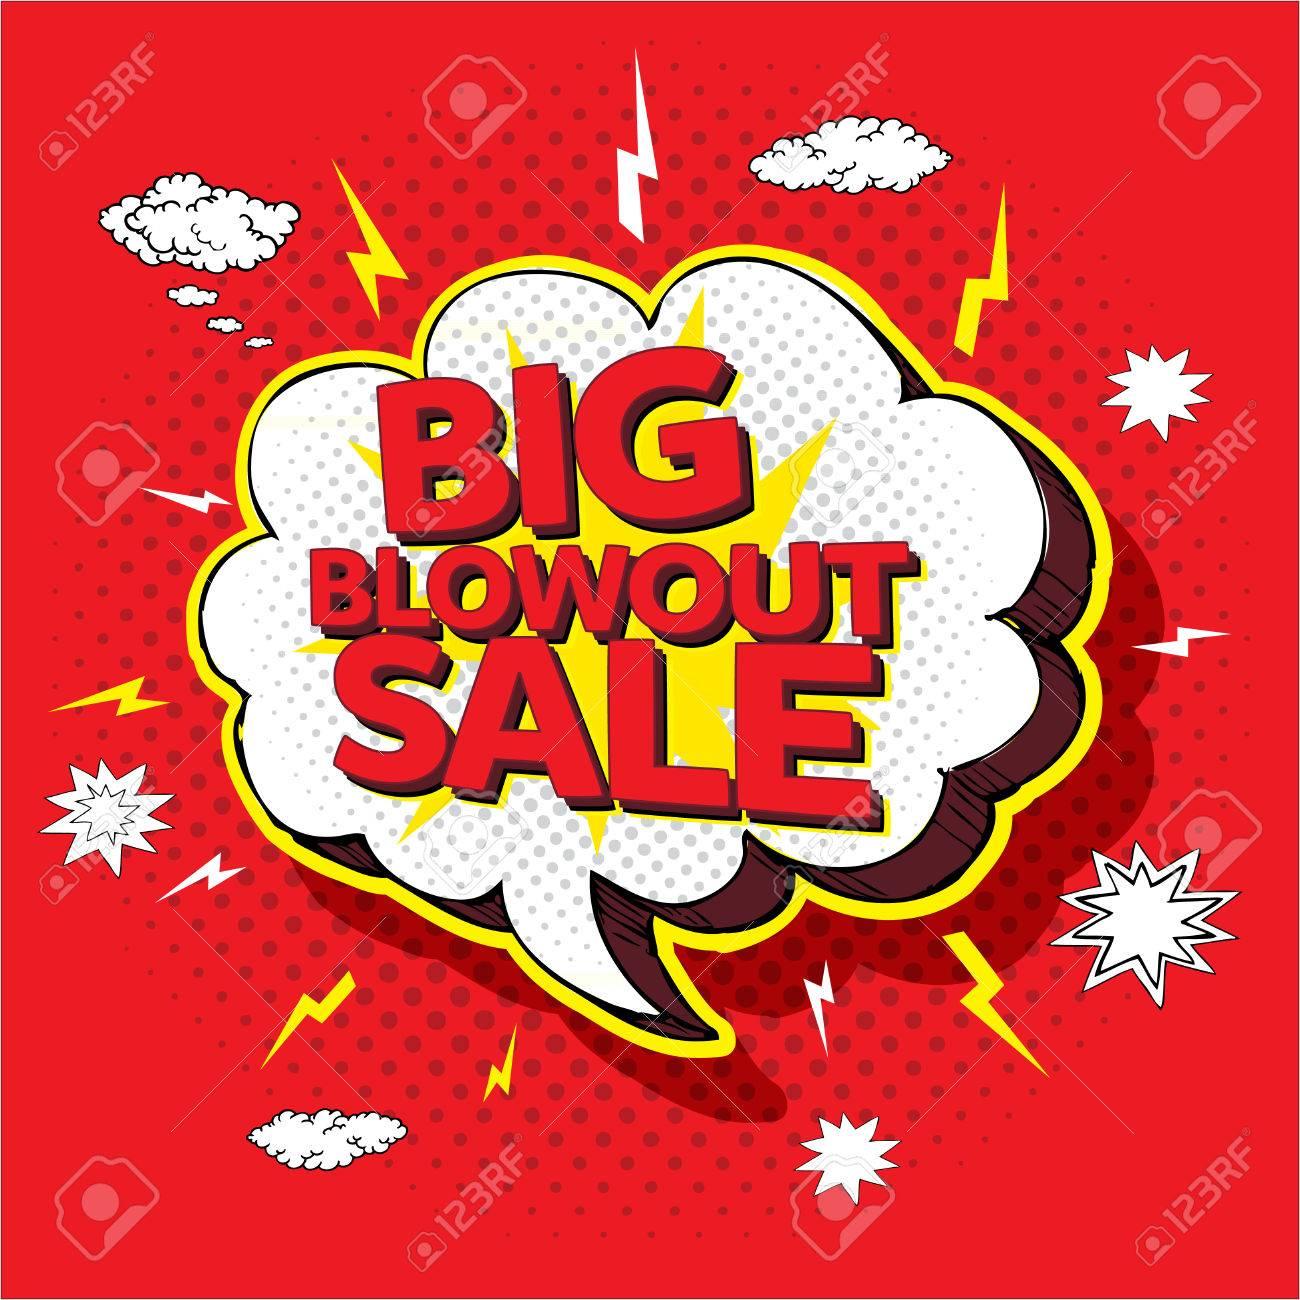 Big blowout sale pop up cartoon banner vector illustration - 44153731